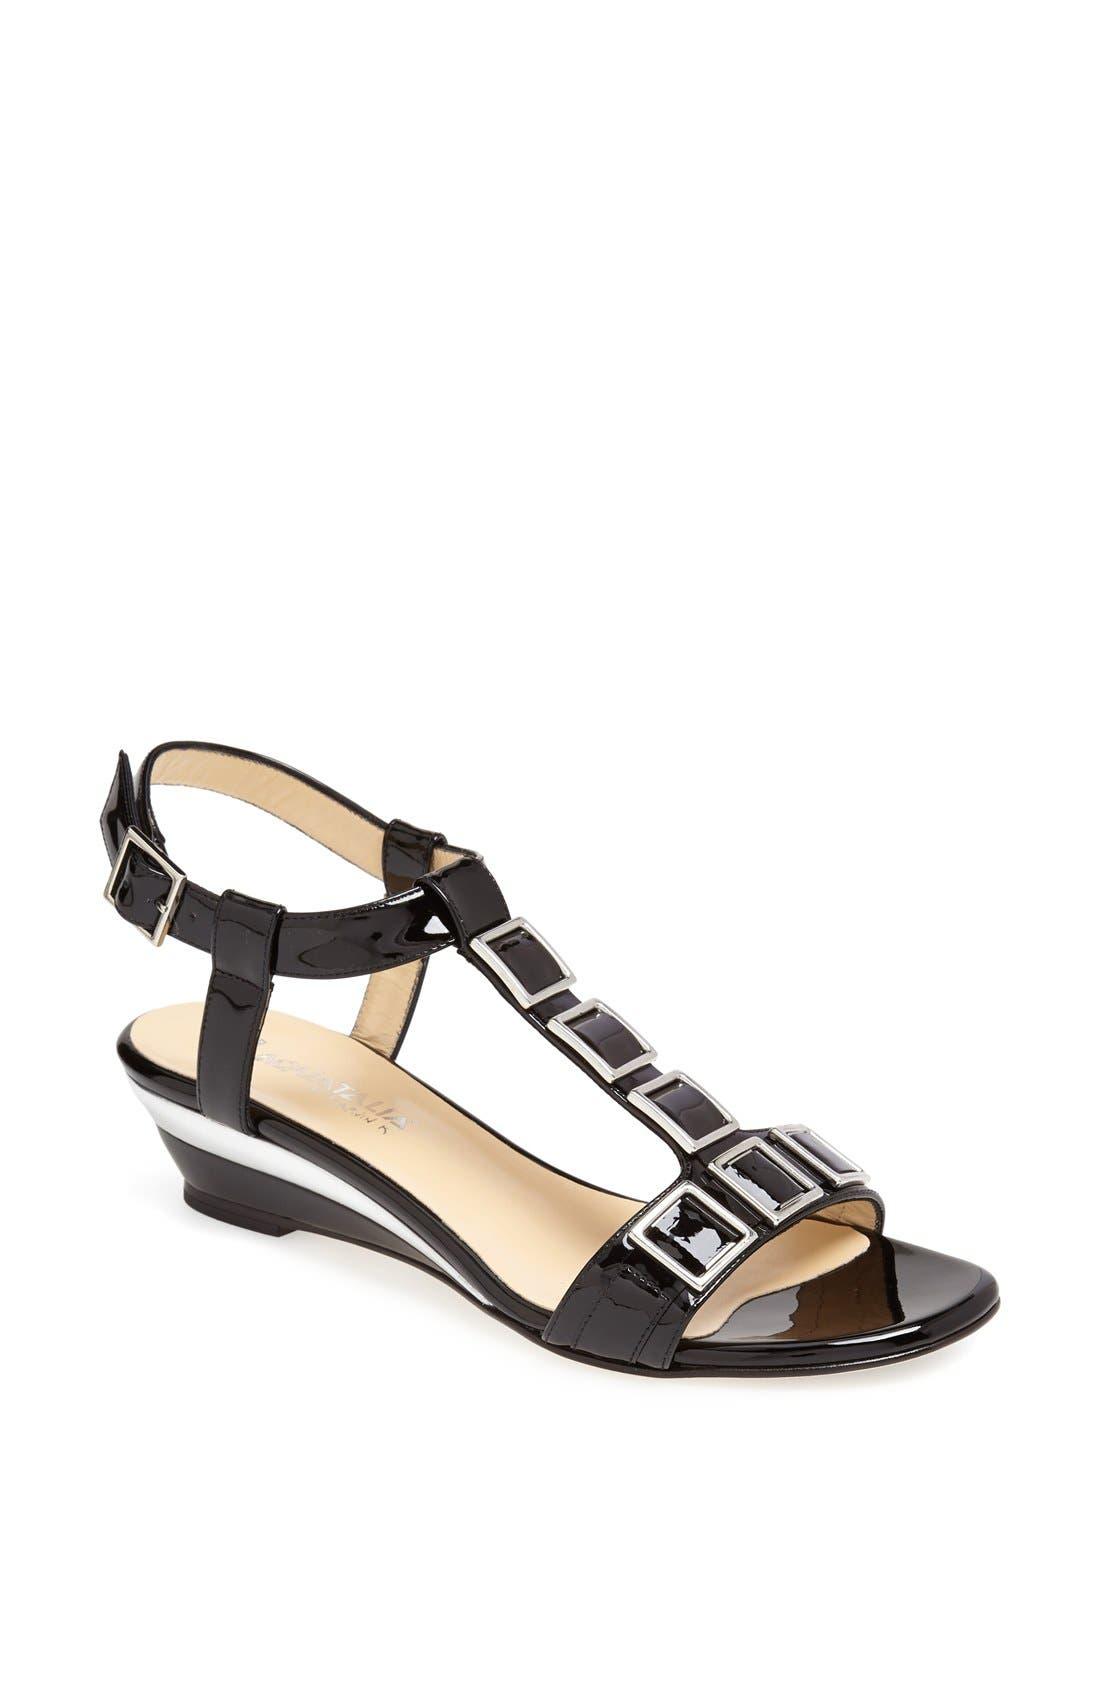 Alternate Image 1 Selected - Aquatalia 'Nella' Sandal